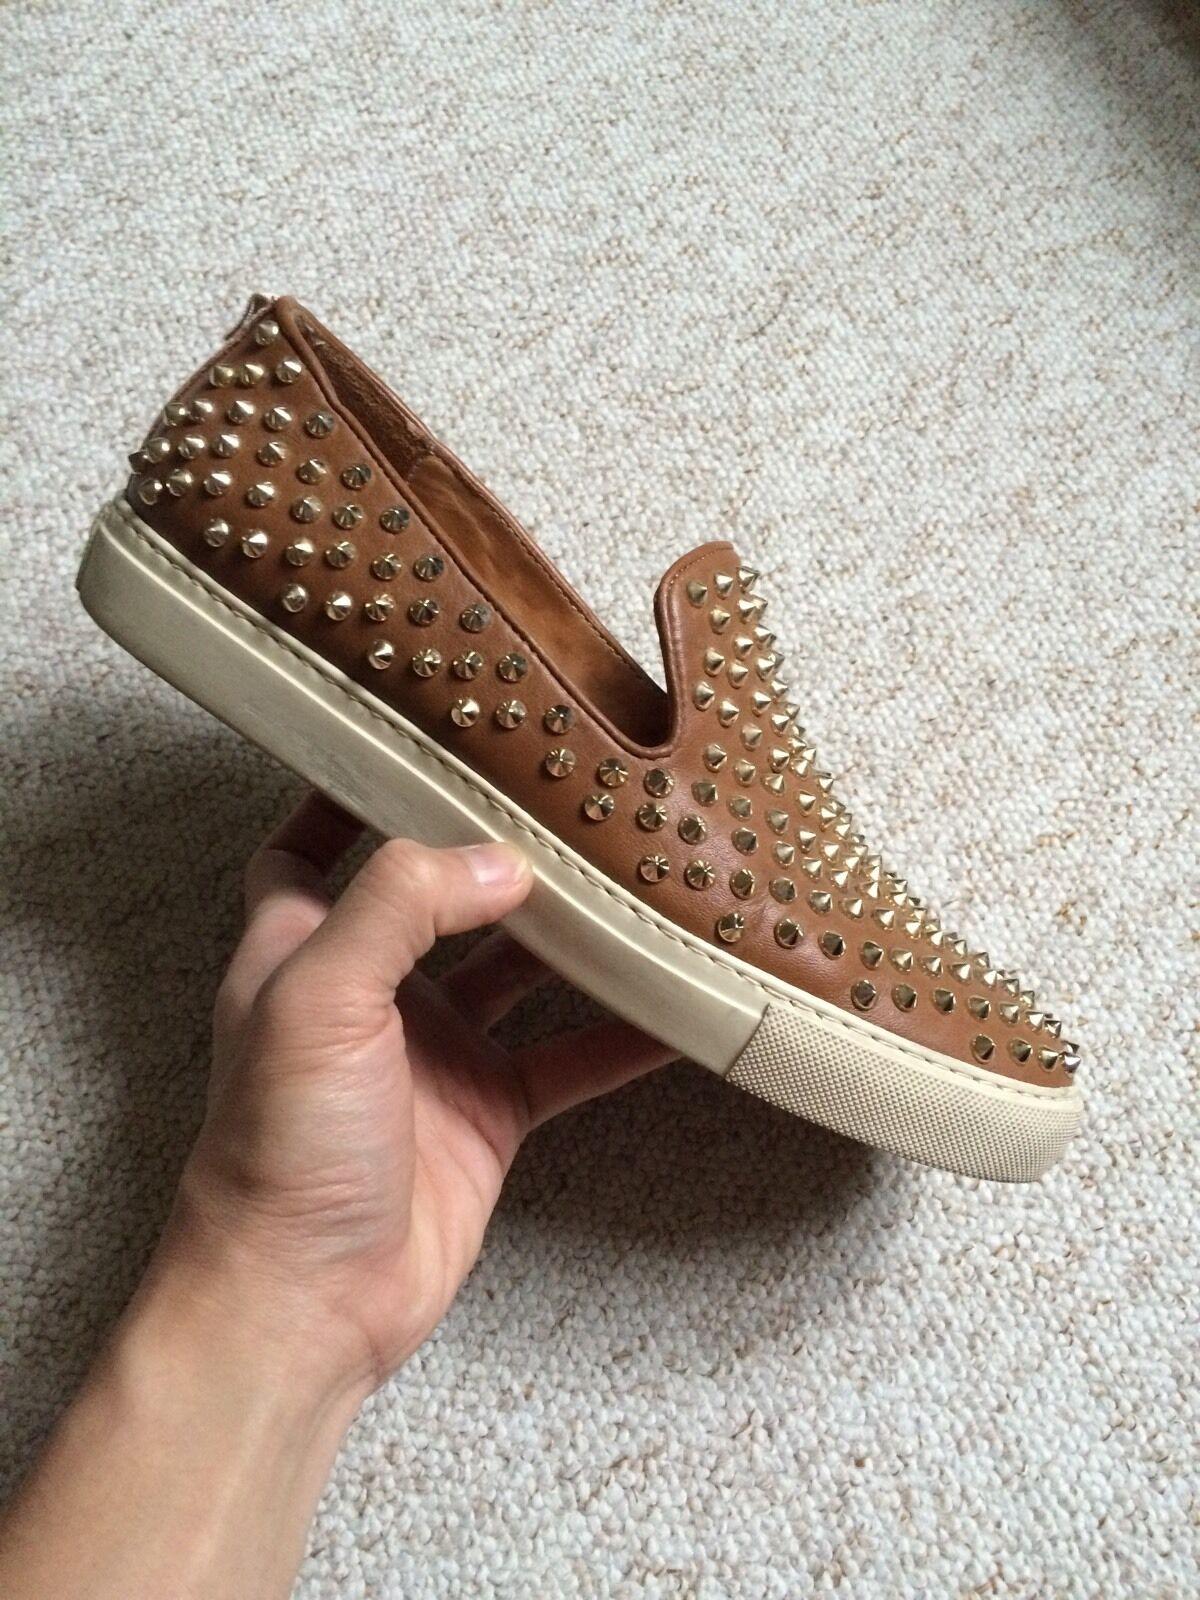 Giacomorelli Leather Slippers SlipOns Loafer Plimsolls Brown gold Studs Eu40